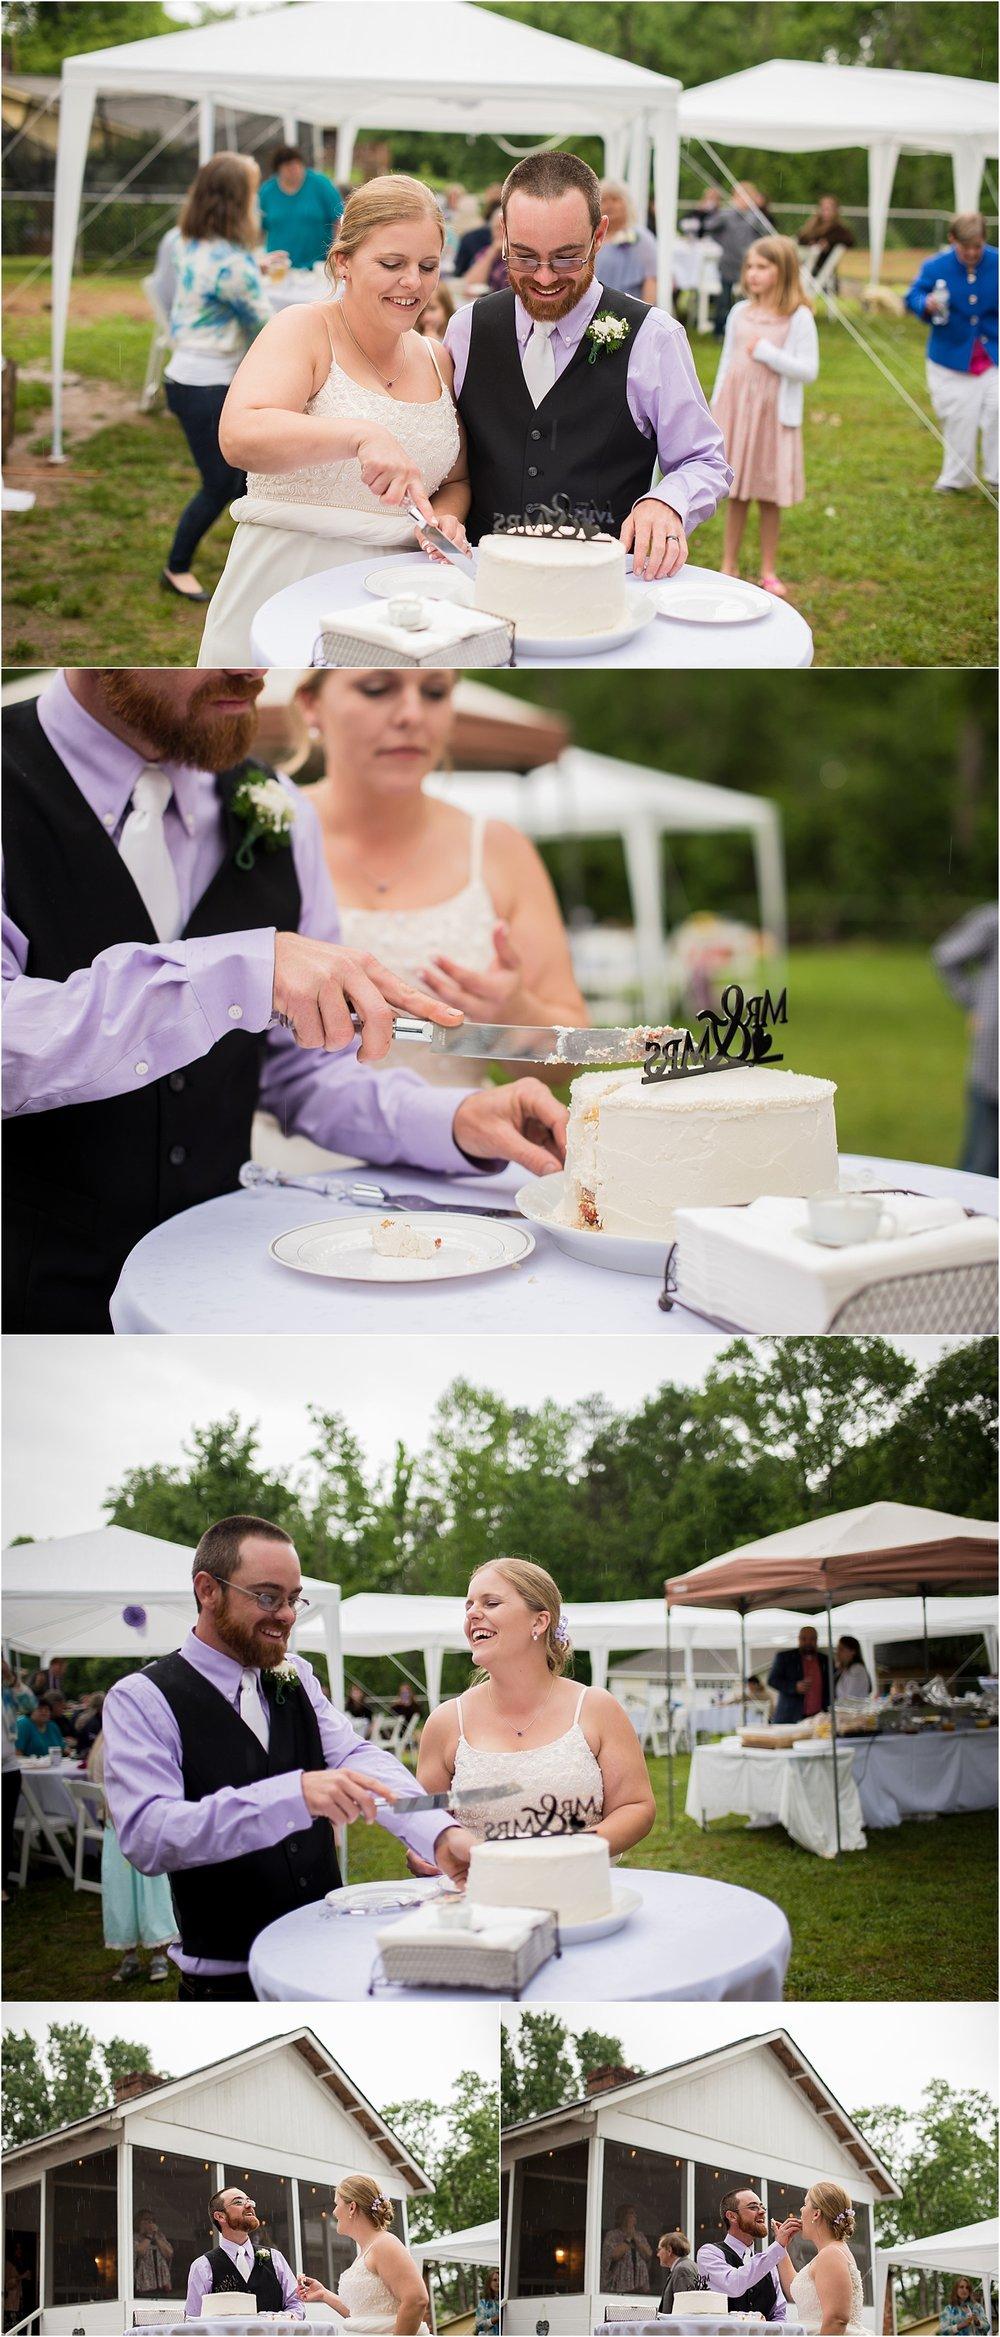 Emily-Josh-Outdoor-Home-Wedding-Foothills-Blue-Ridge-Mountains